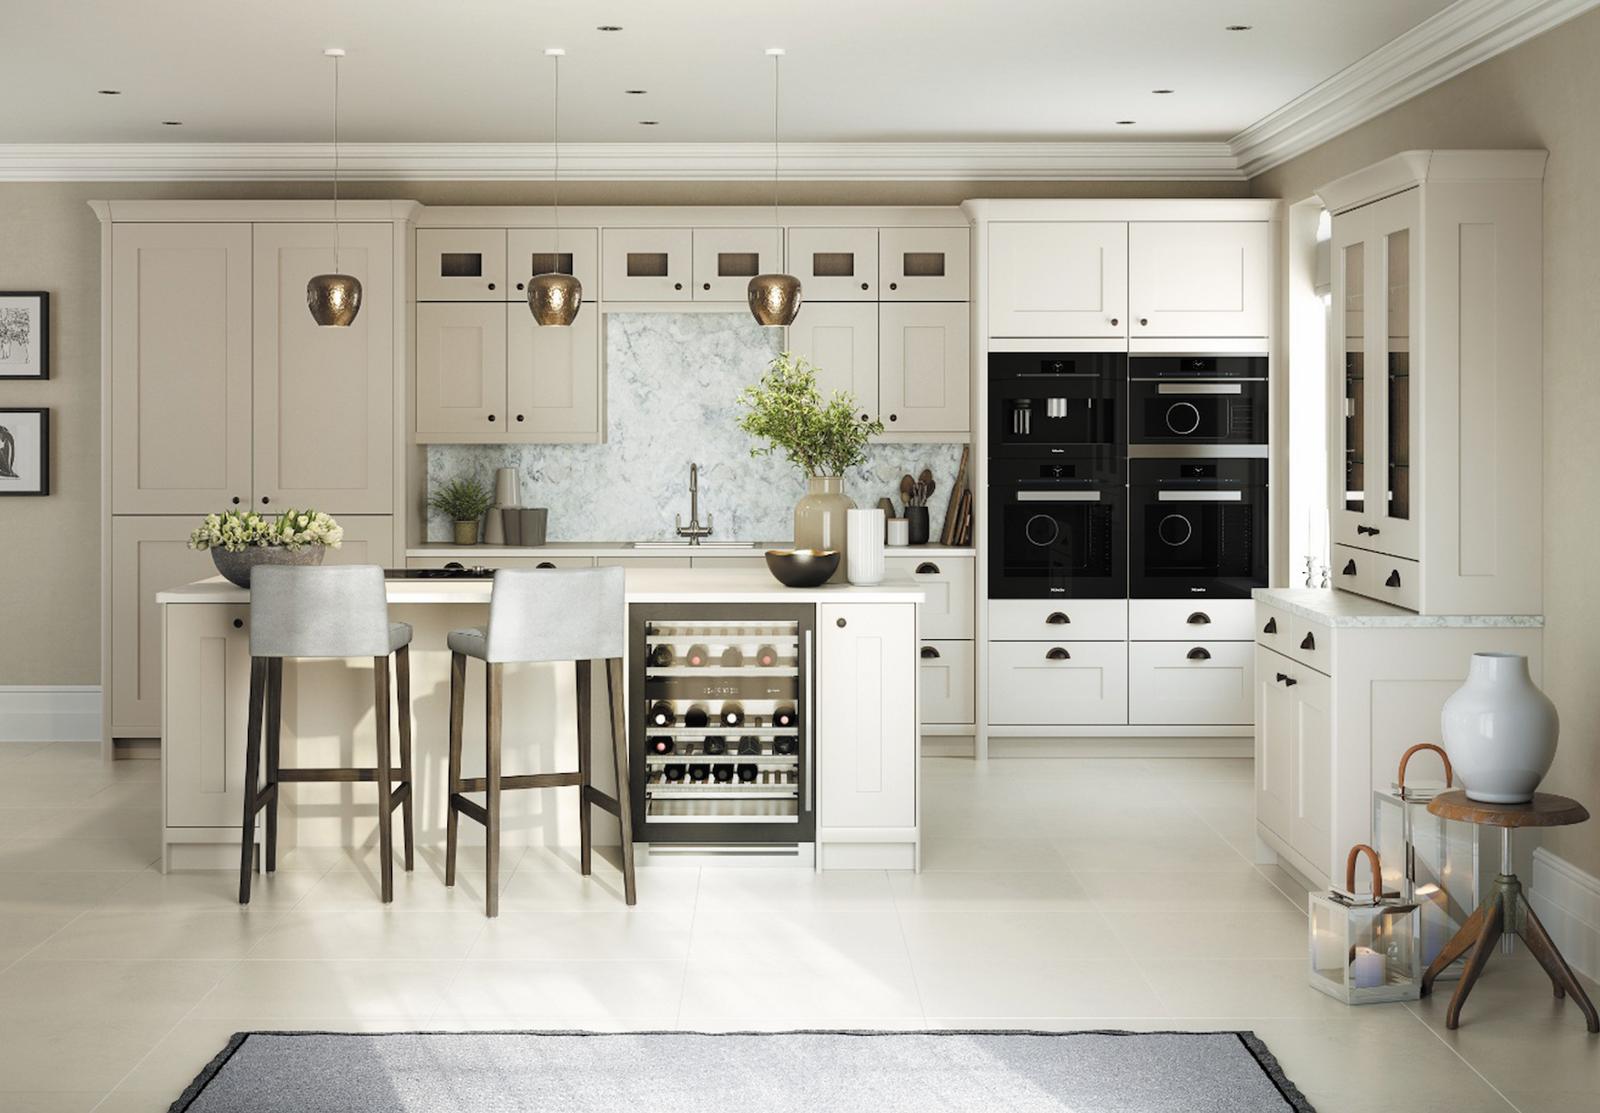 10 Kitchen Design Trends We Ll Be Seeing In 2017 Kitchen Trends